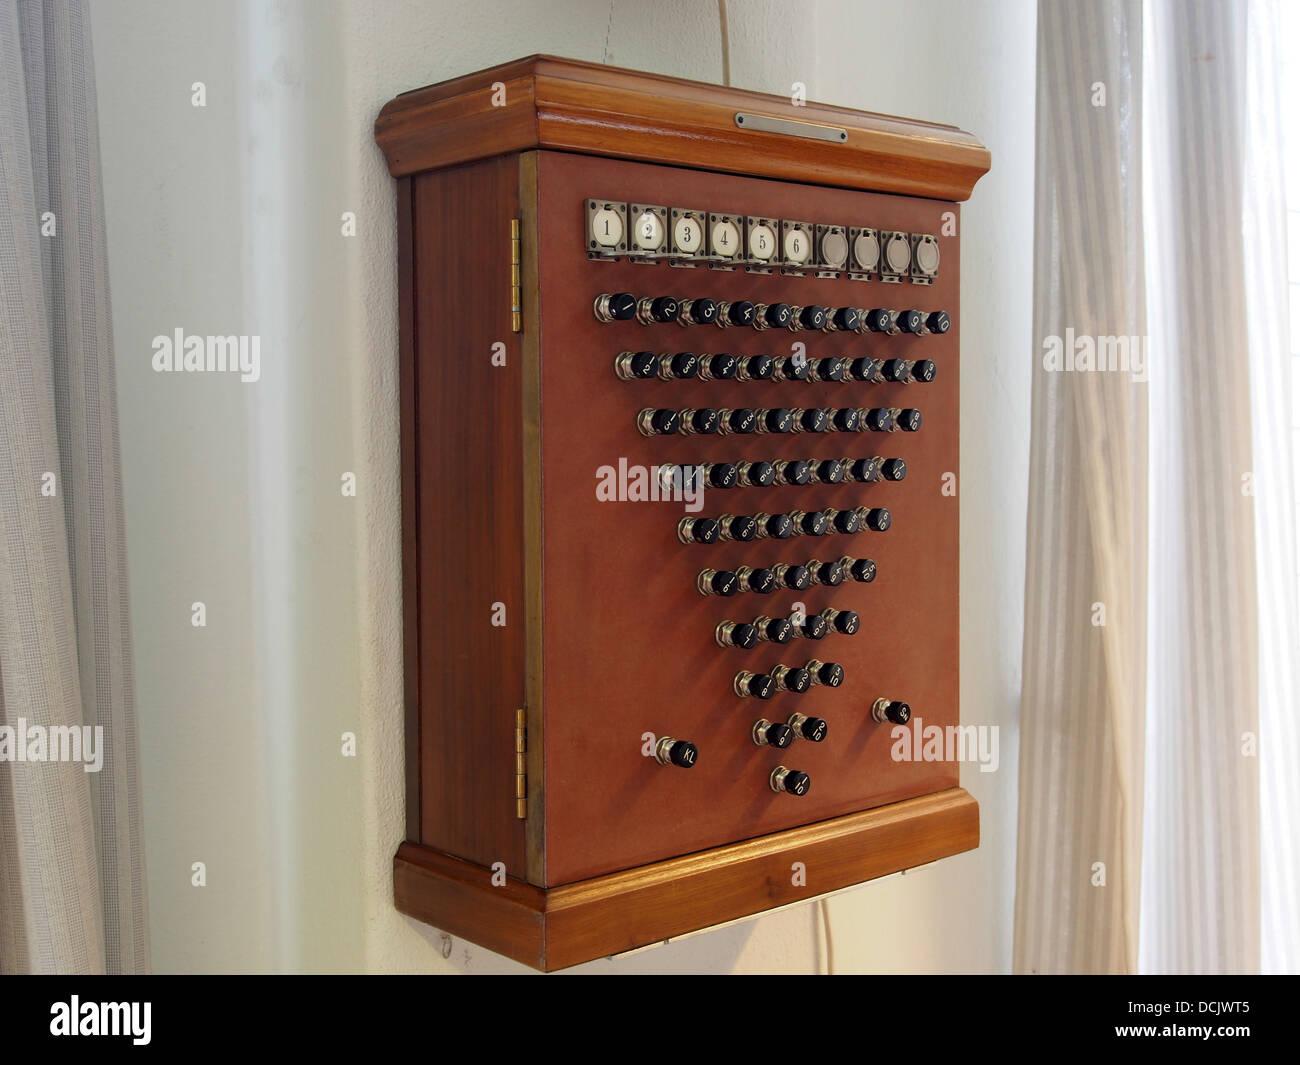 Some kind of switchbox, photographed at the Aalborg Forsvars- og Garnisonsmuseum - Stock Image